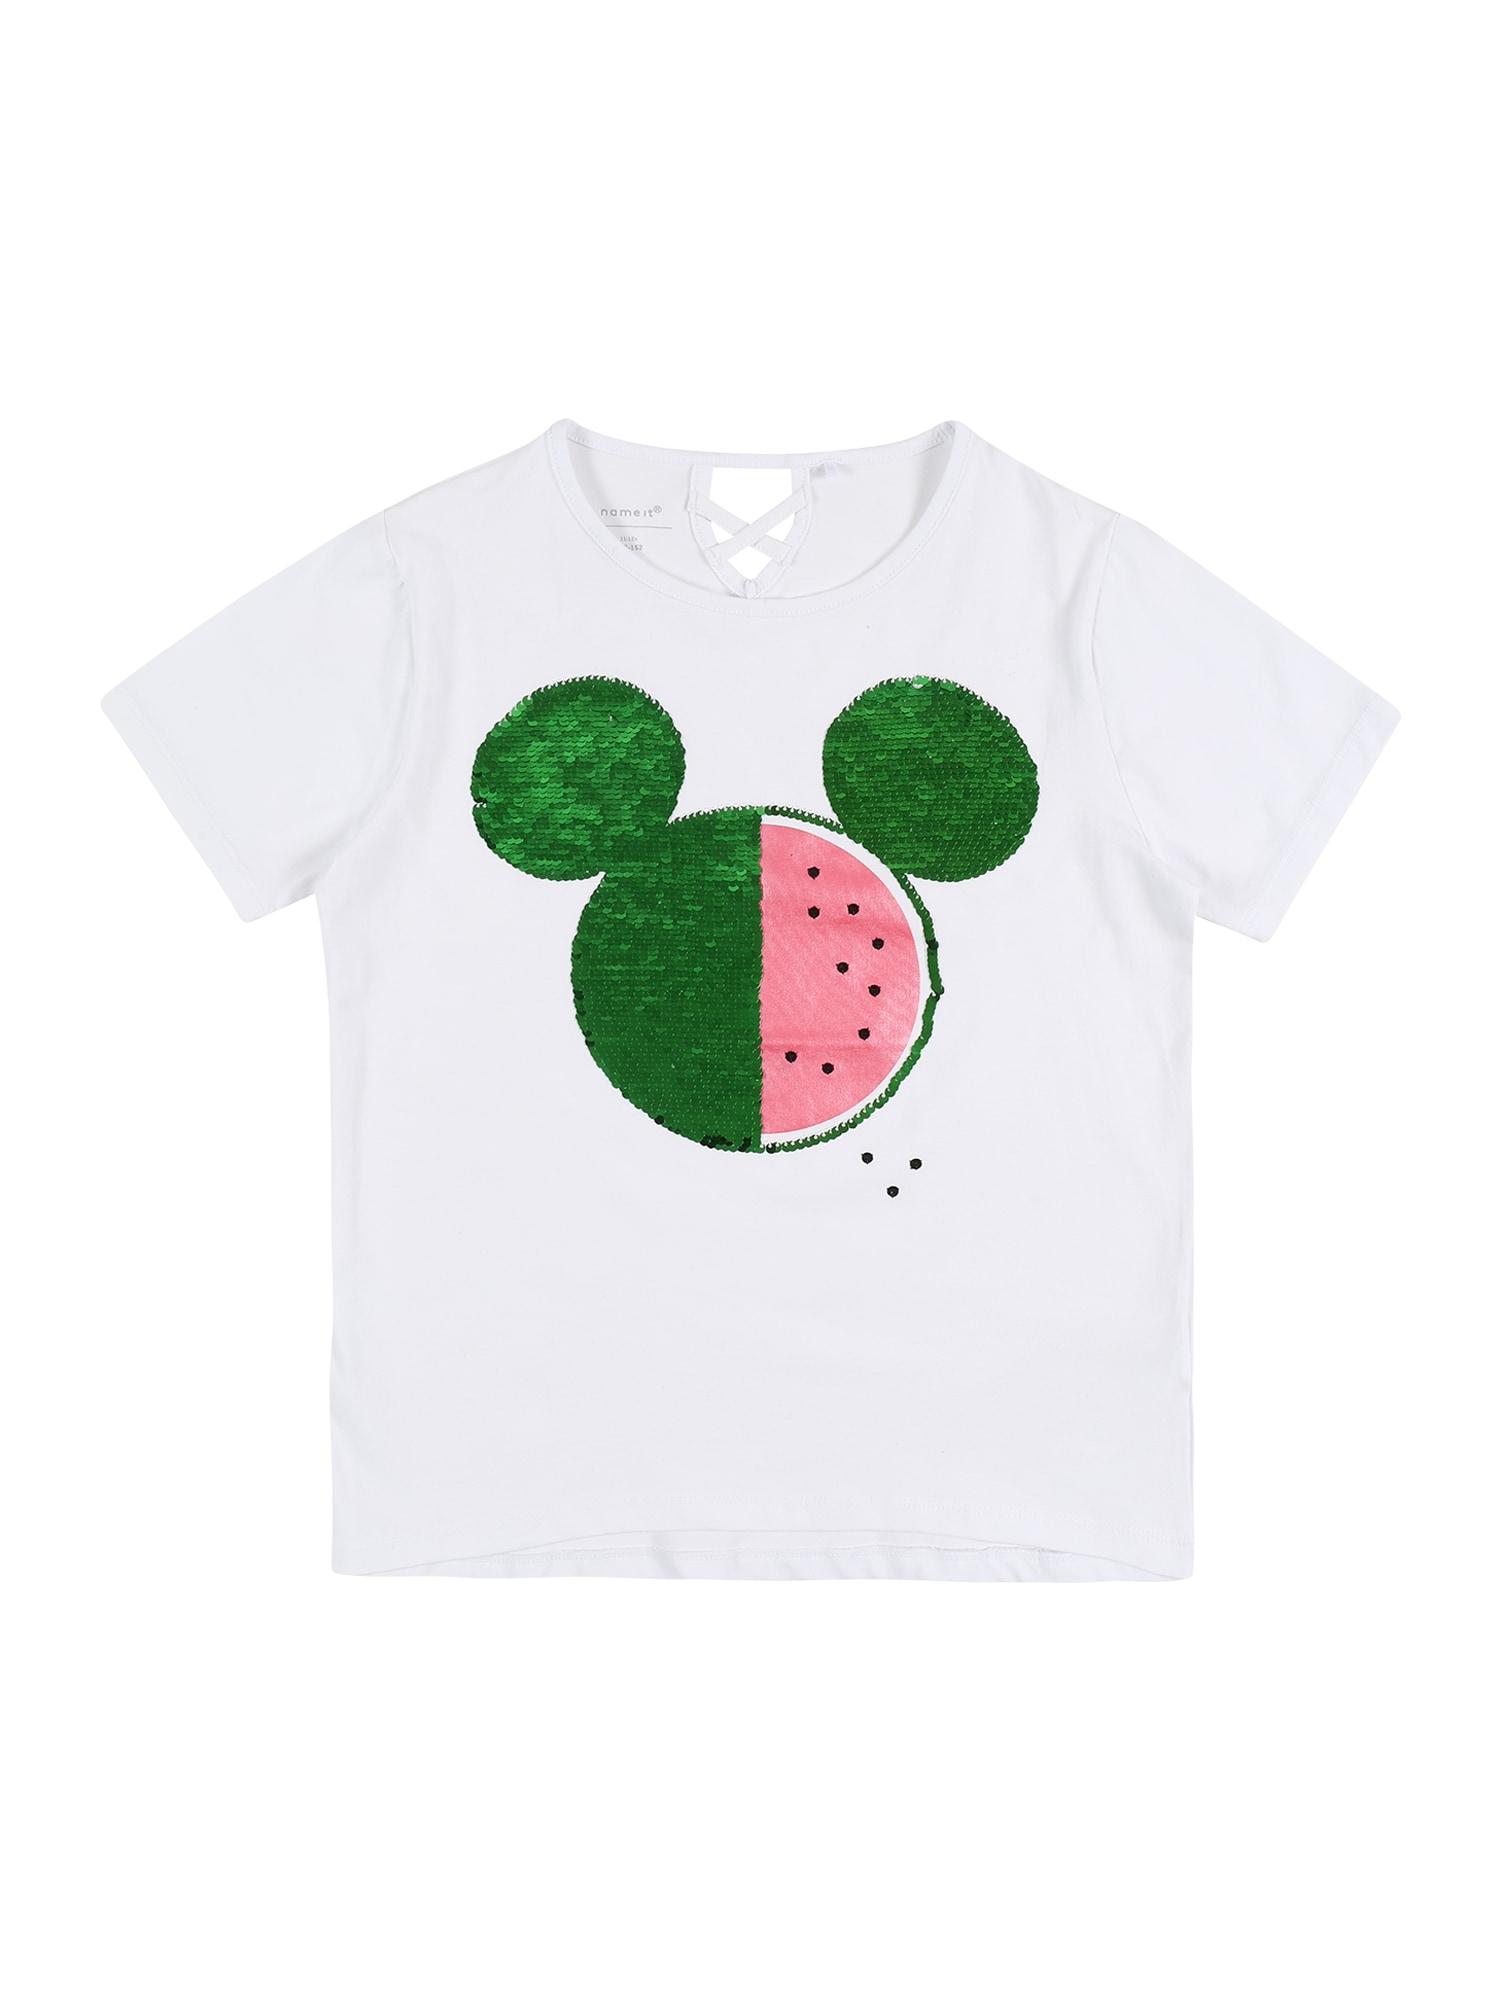 NAME IT Tričko 'Minnie'  bílá